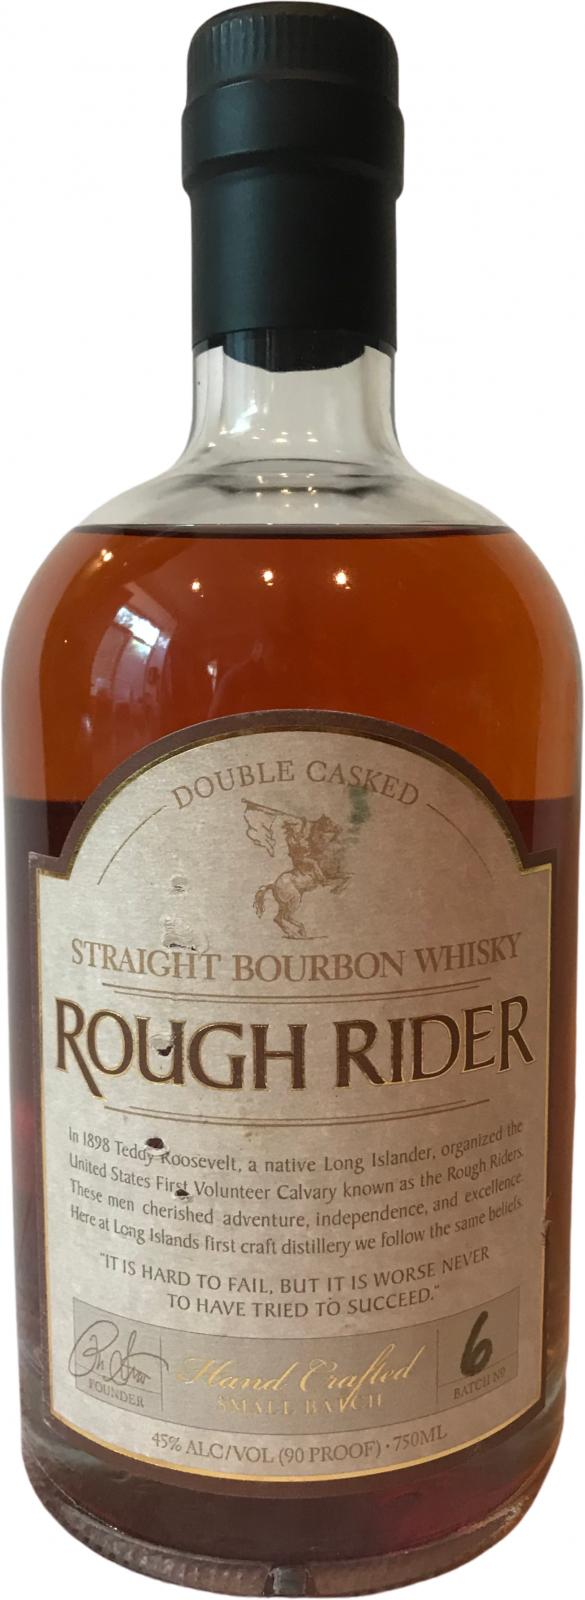 Rough Rider Double Casked Straight Bourbon